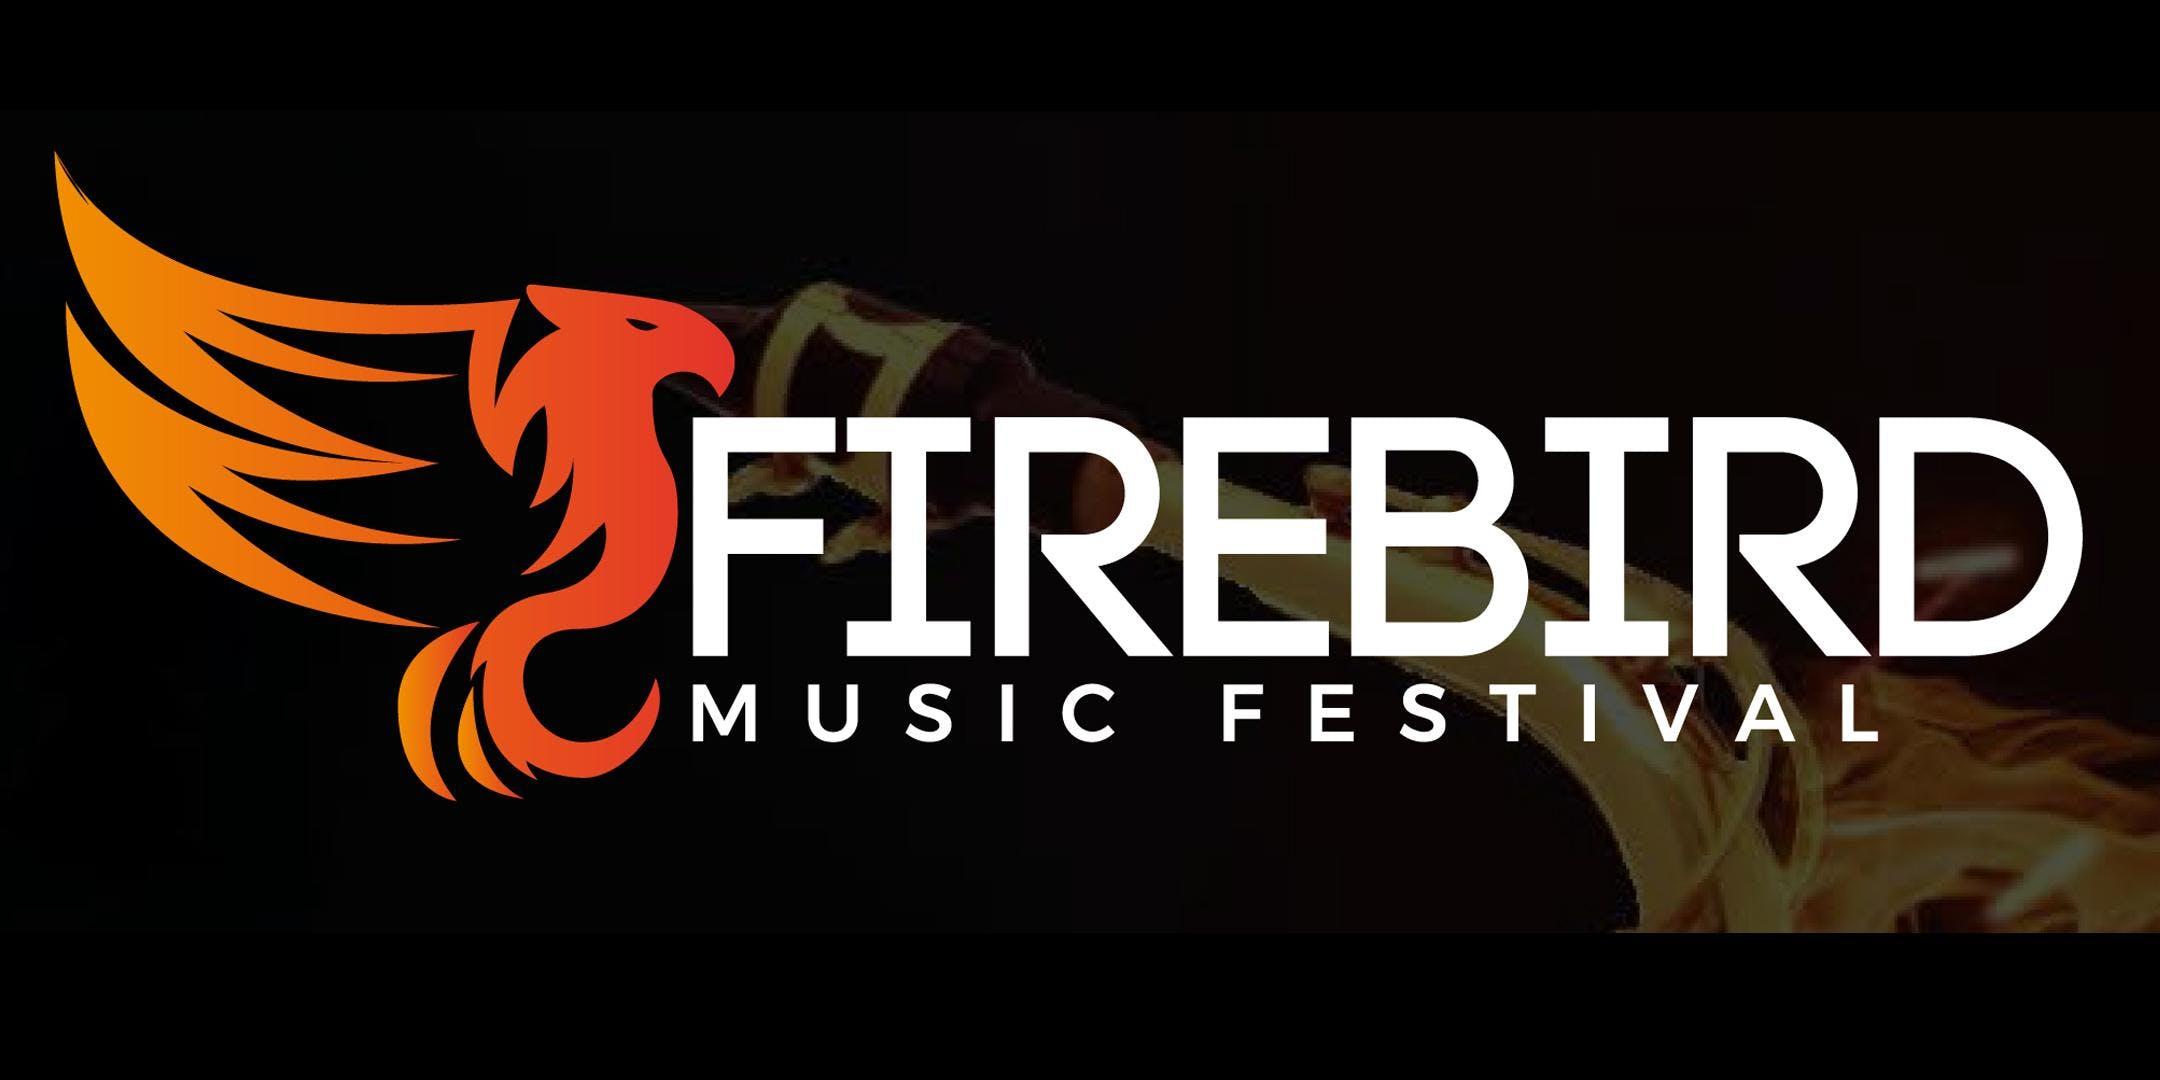 BLOCKTIX presents FIREBIRD MUSIC FESTIVAL with Jeffrey Osborne | Earl Klugh & Bob James | Dee Dee Bridgewater | Rick Braun | Jazz Funk Soul